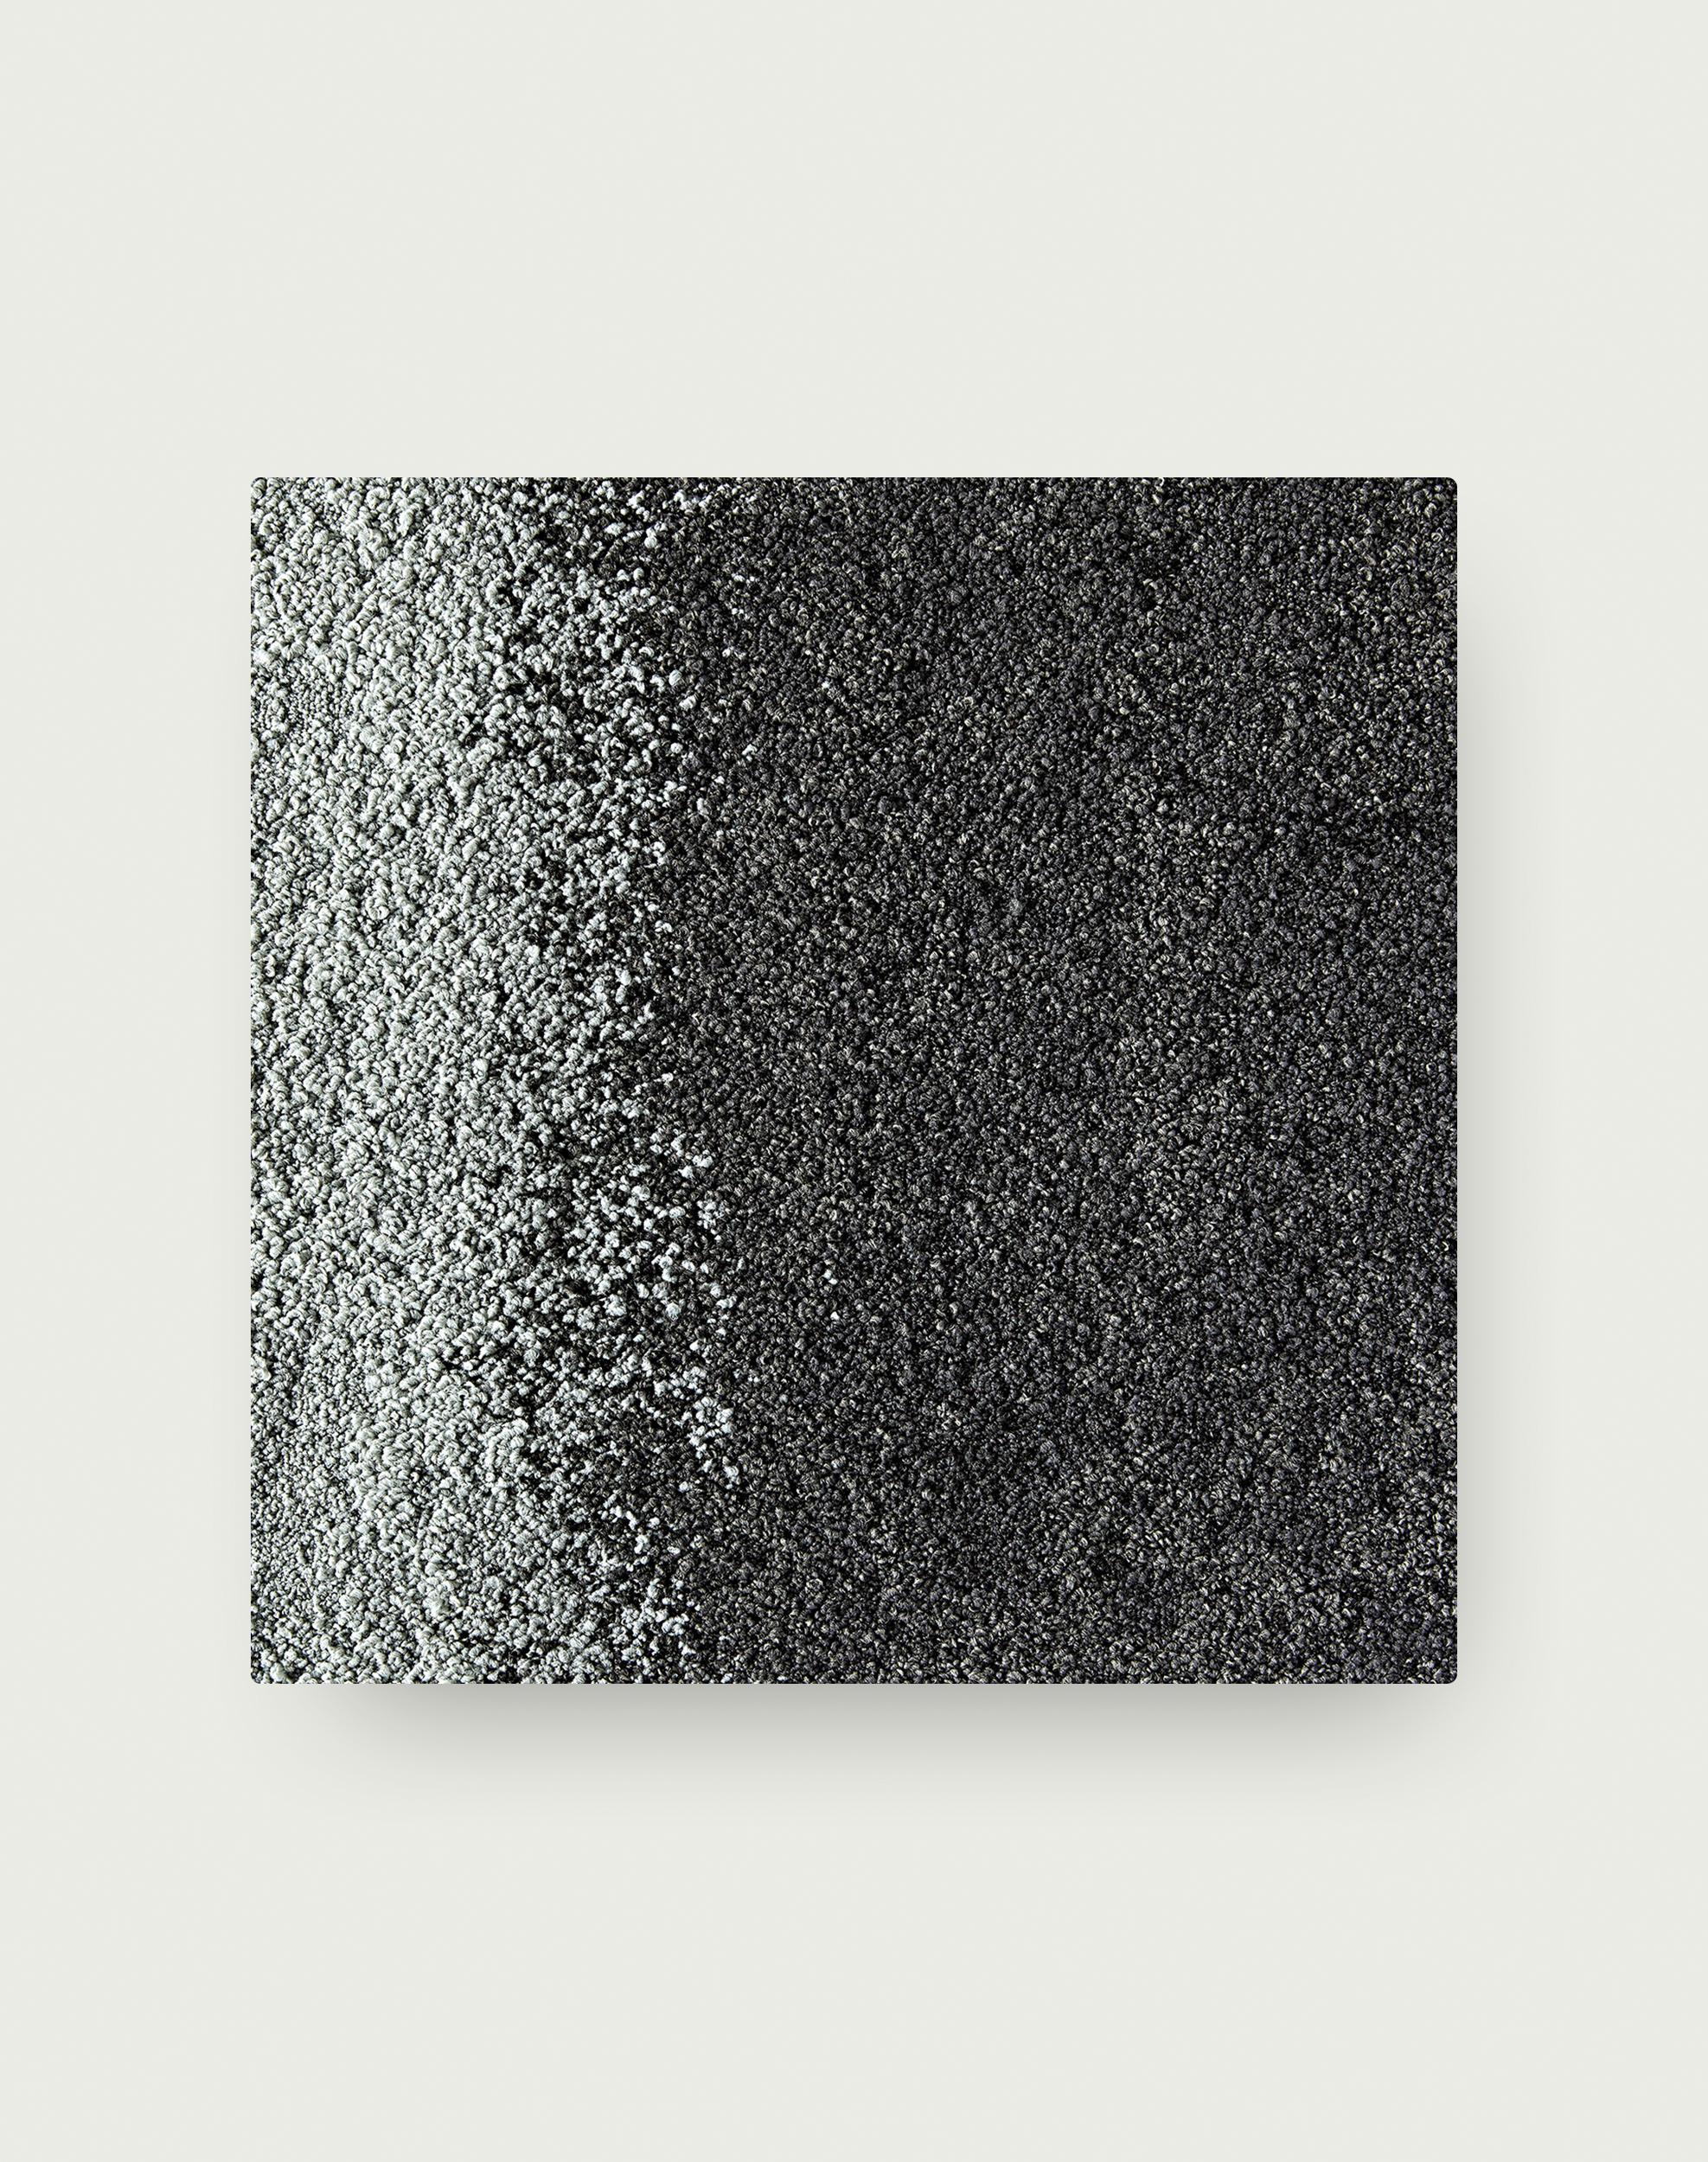 Urban Nature - Charcoal / Lichen